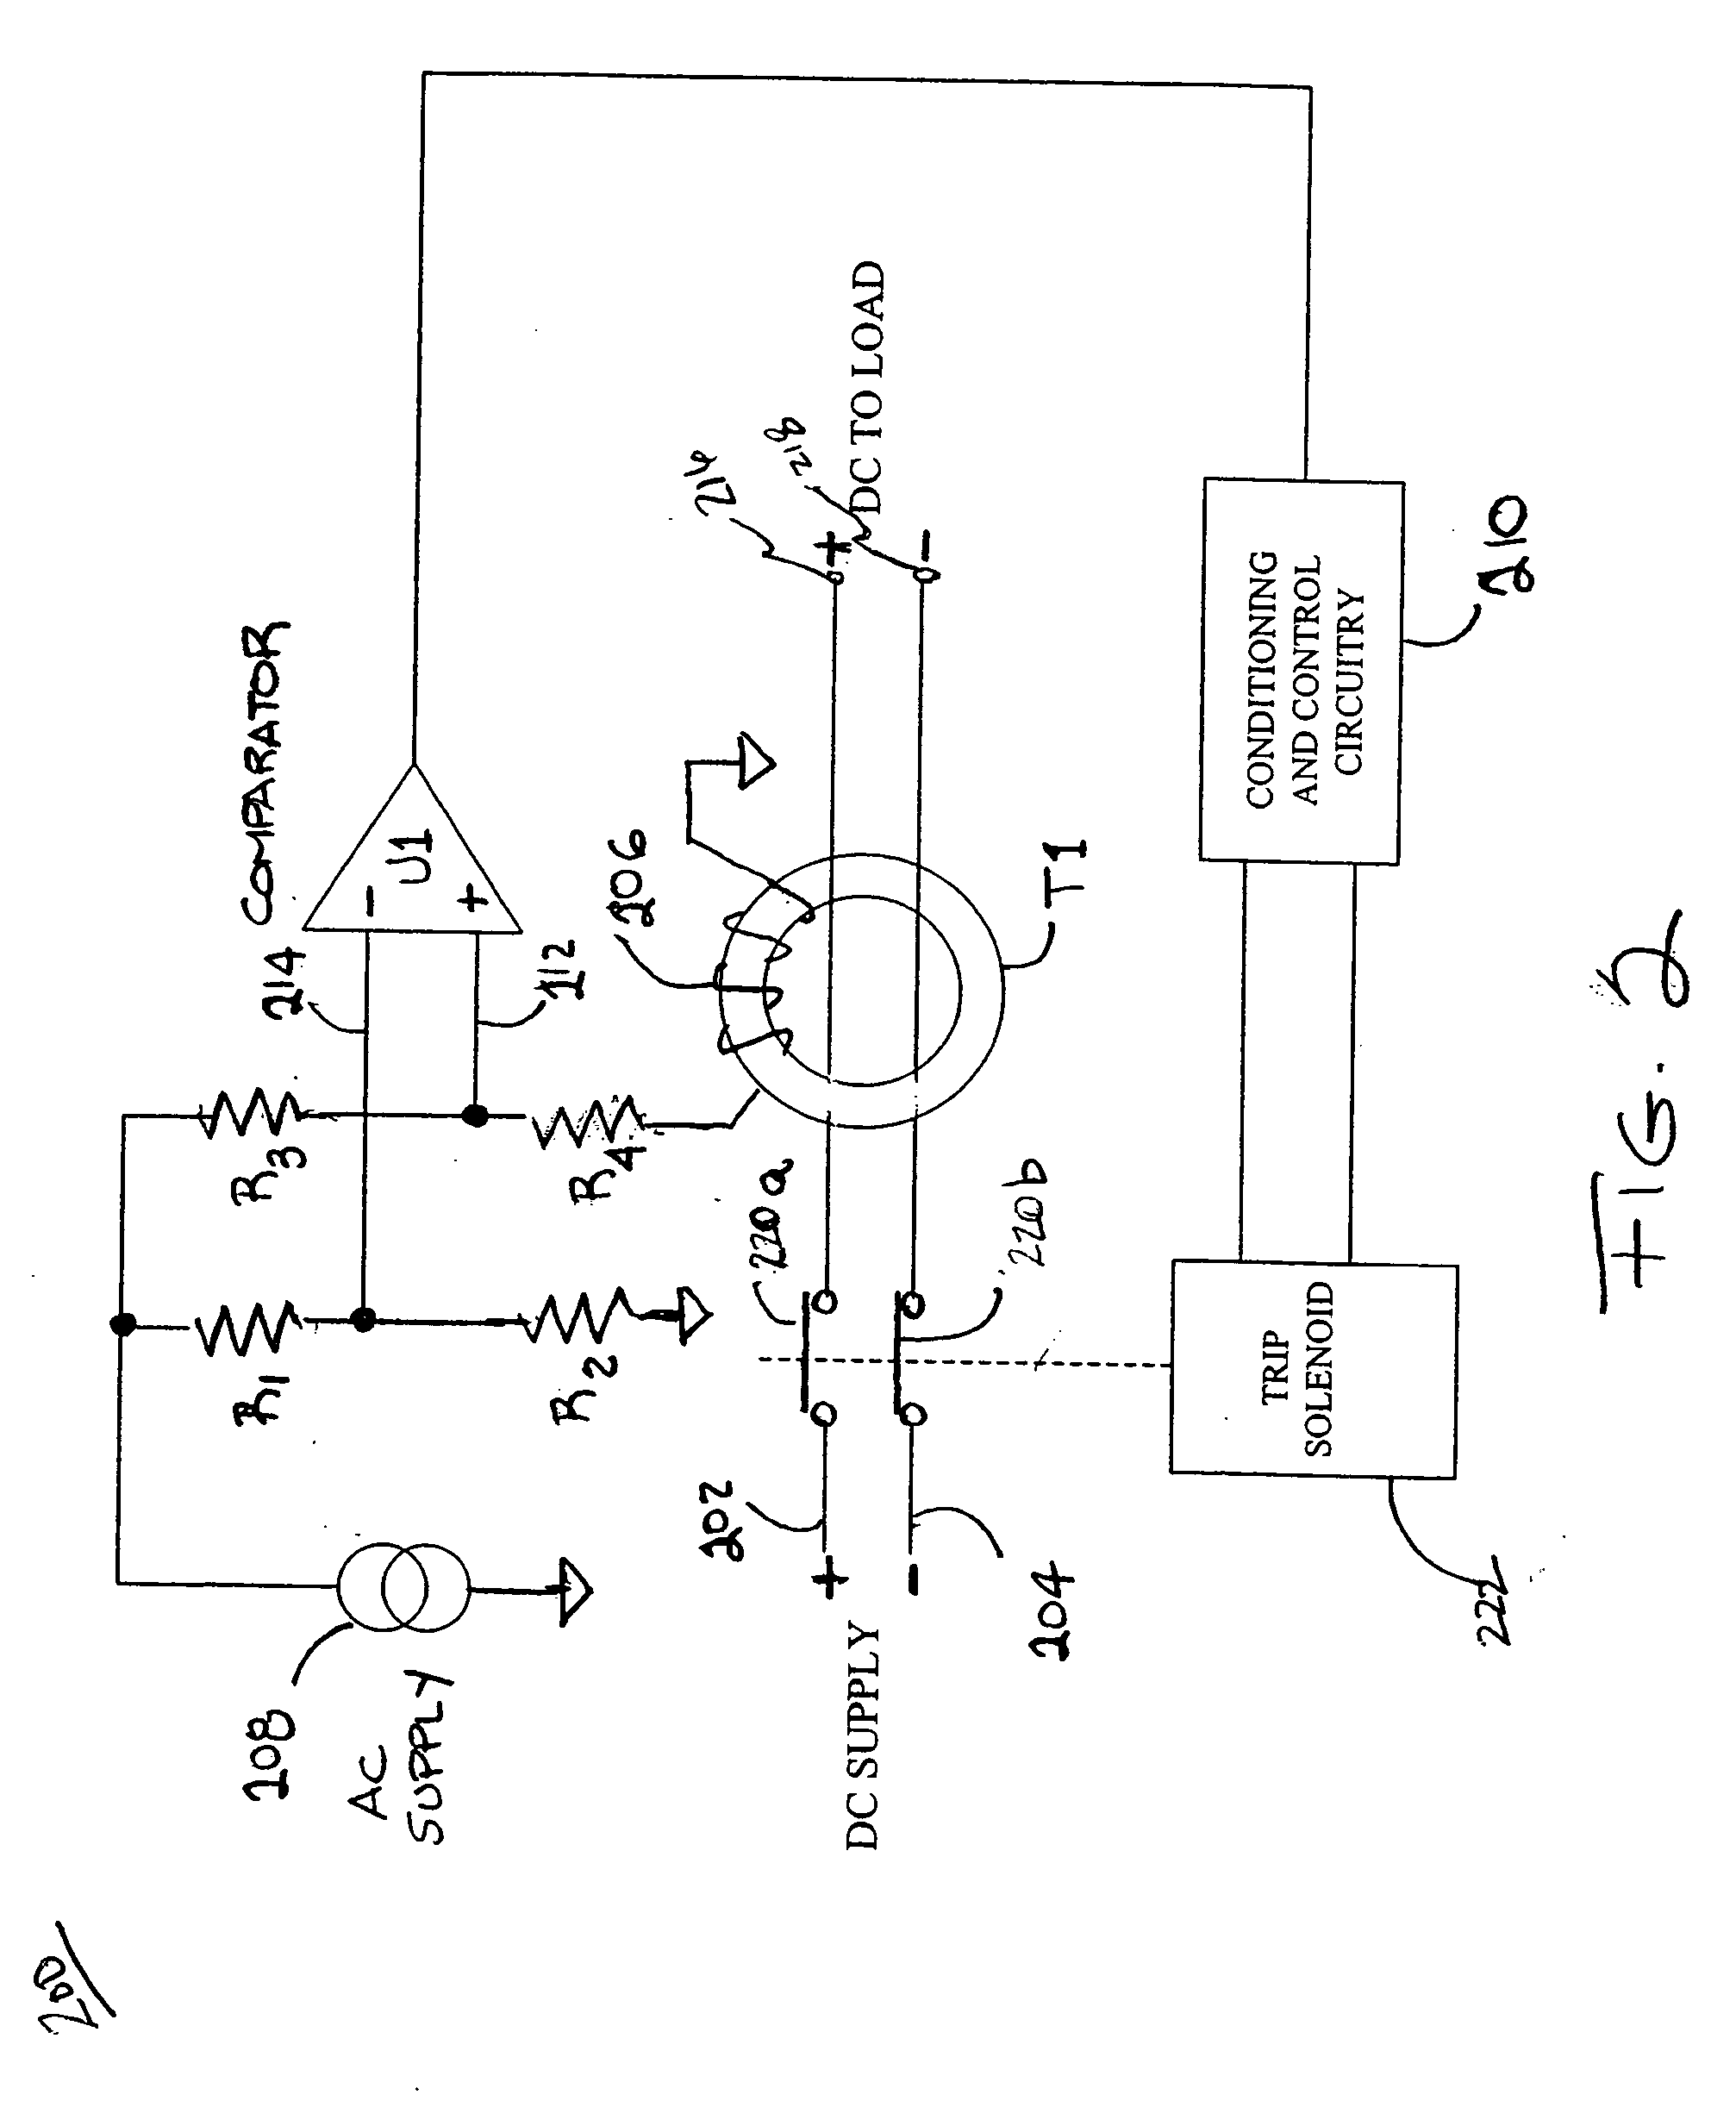 patent us20060187594 - dc ground fault circuit interrupter